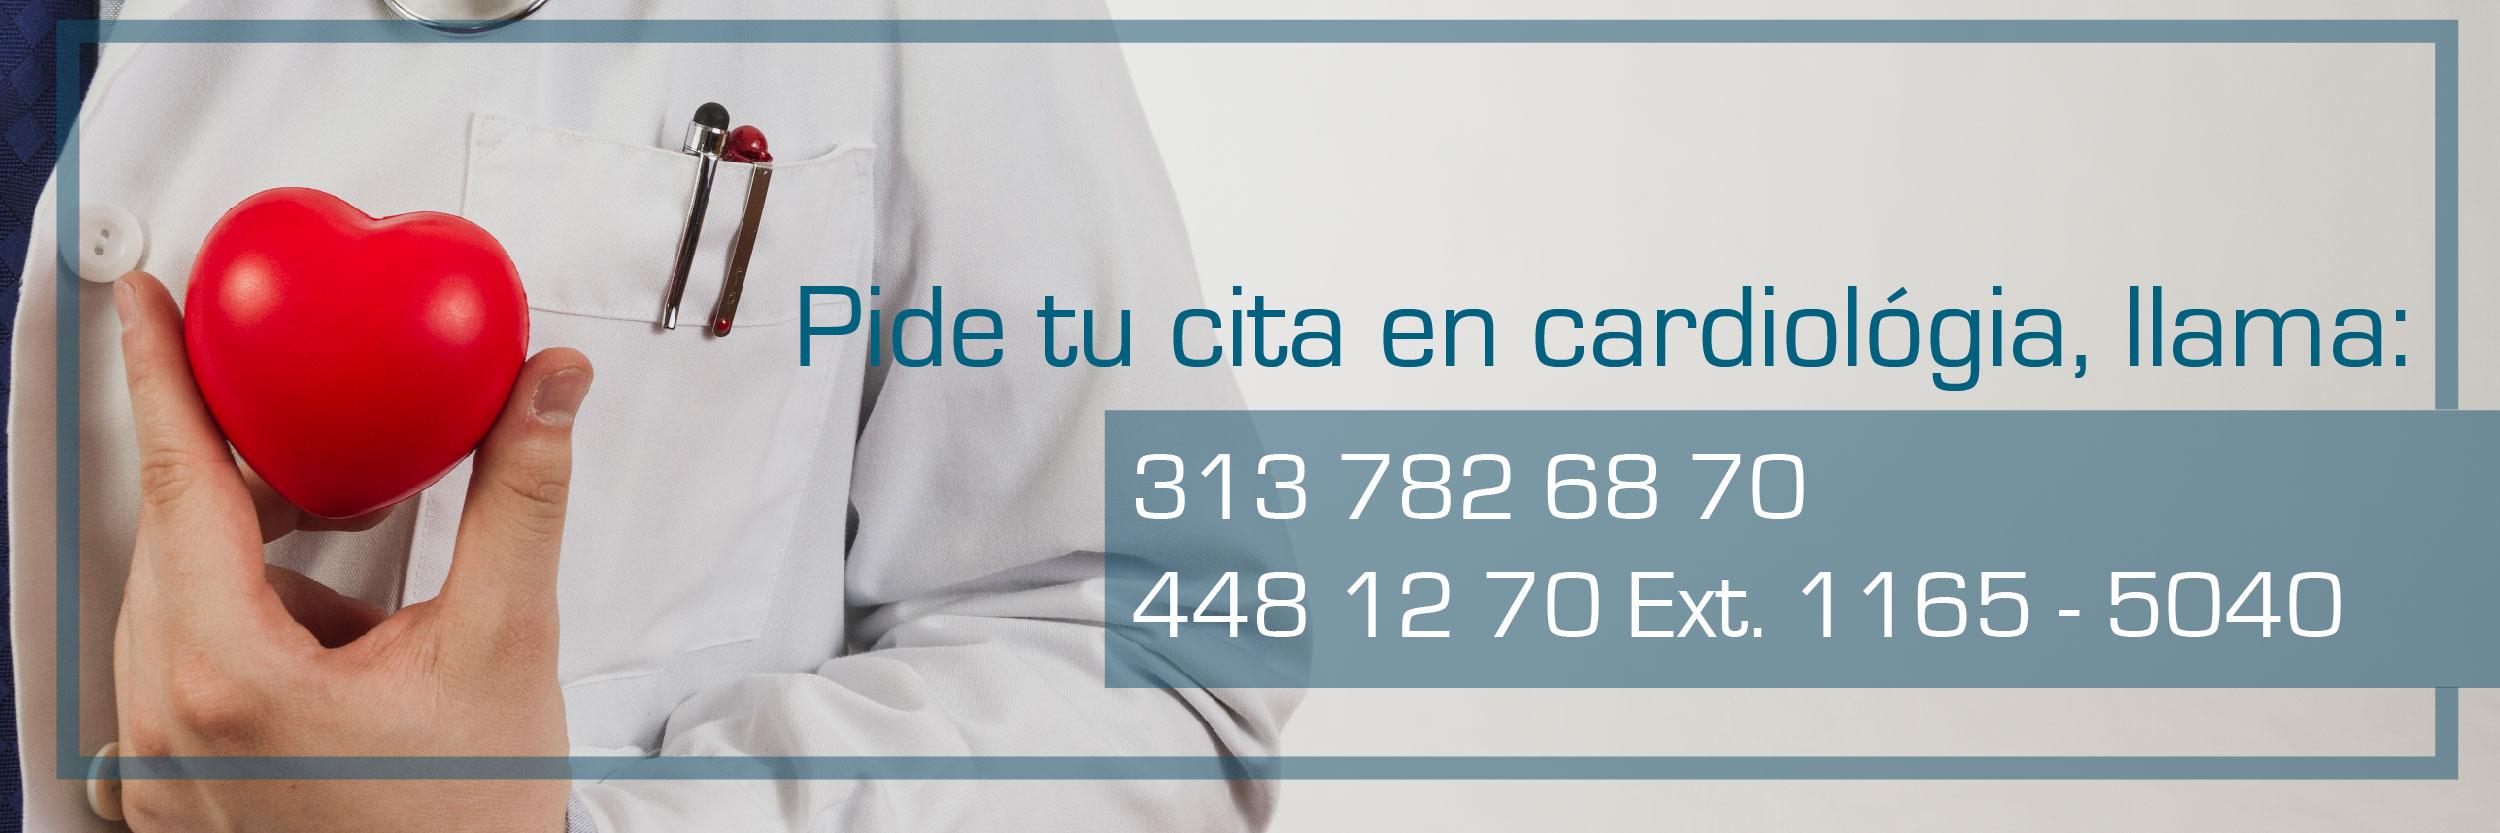 Cita con Cardiólogo en Clínica del Norte en Bello Antioquia